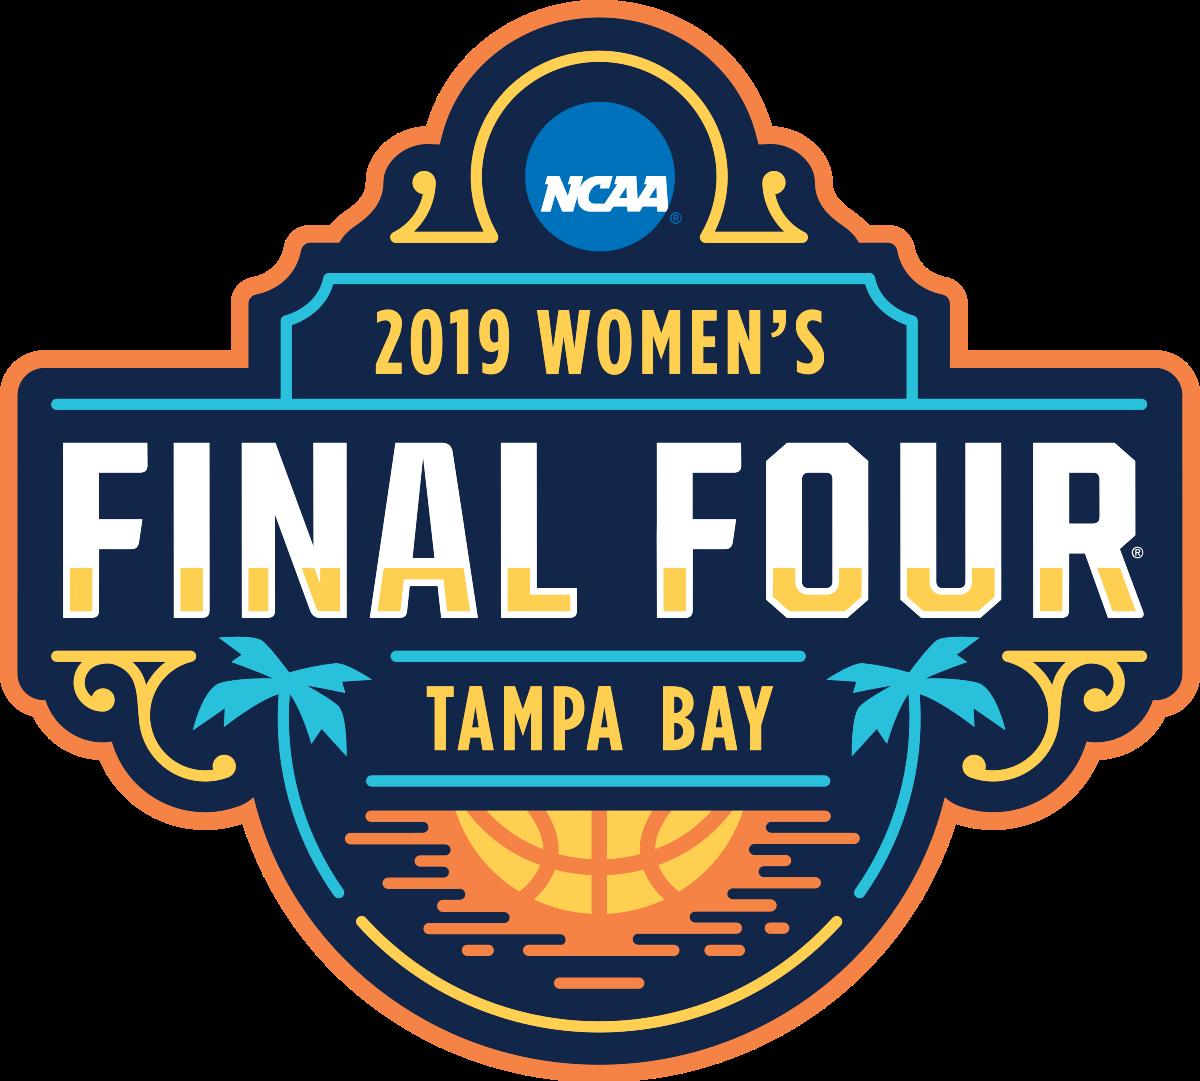 Women's NCAA Final Four 2019: Schedule